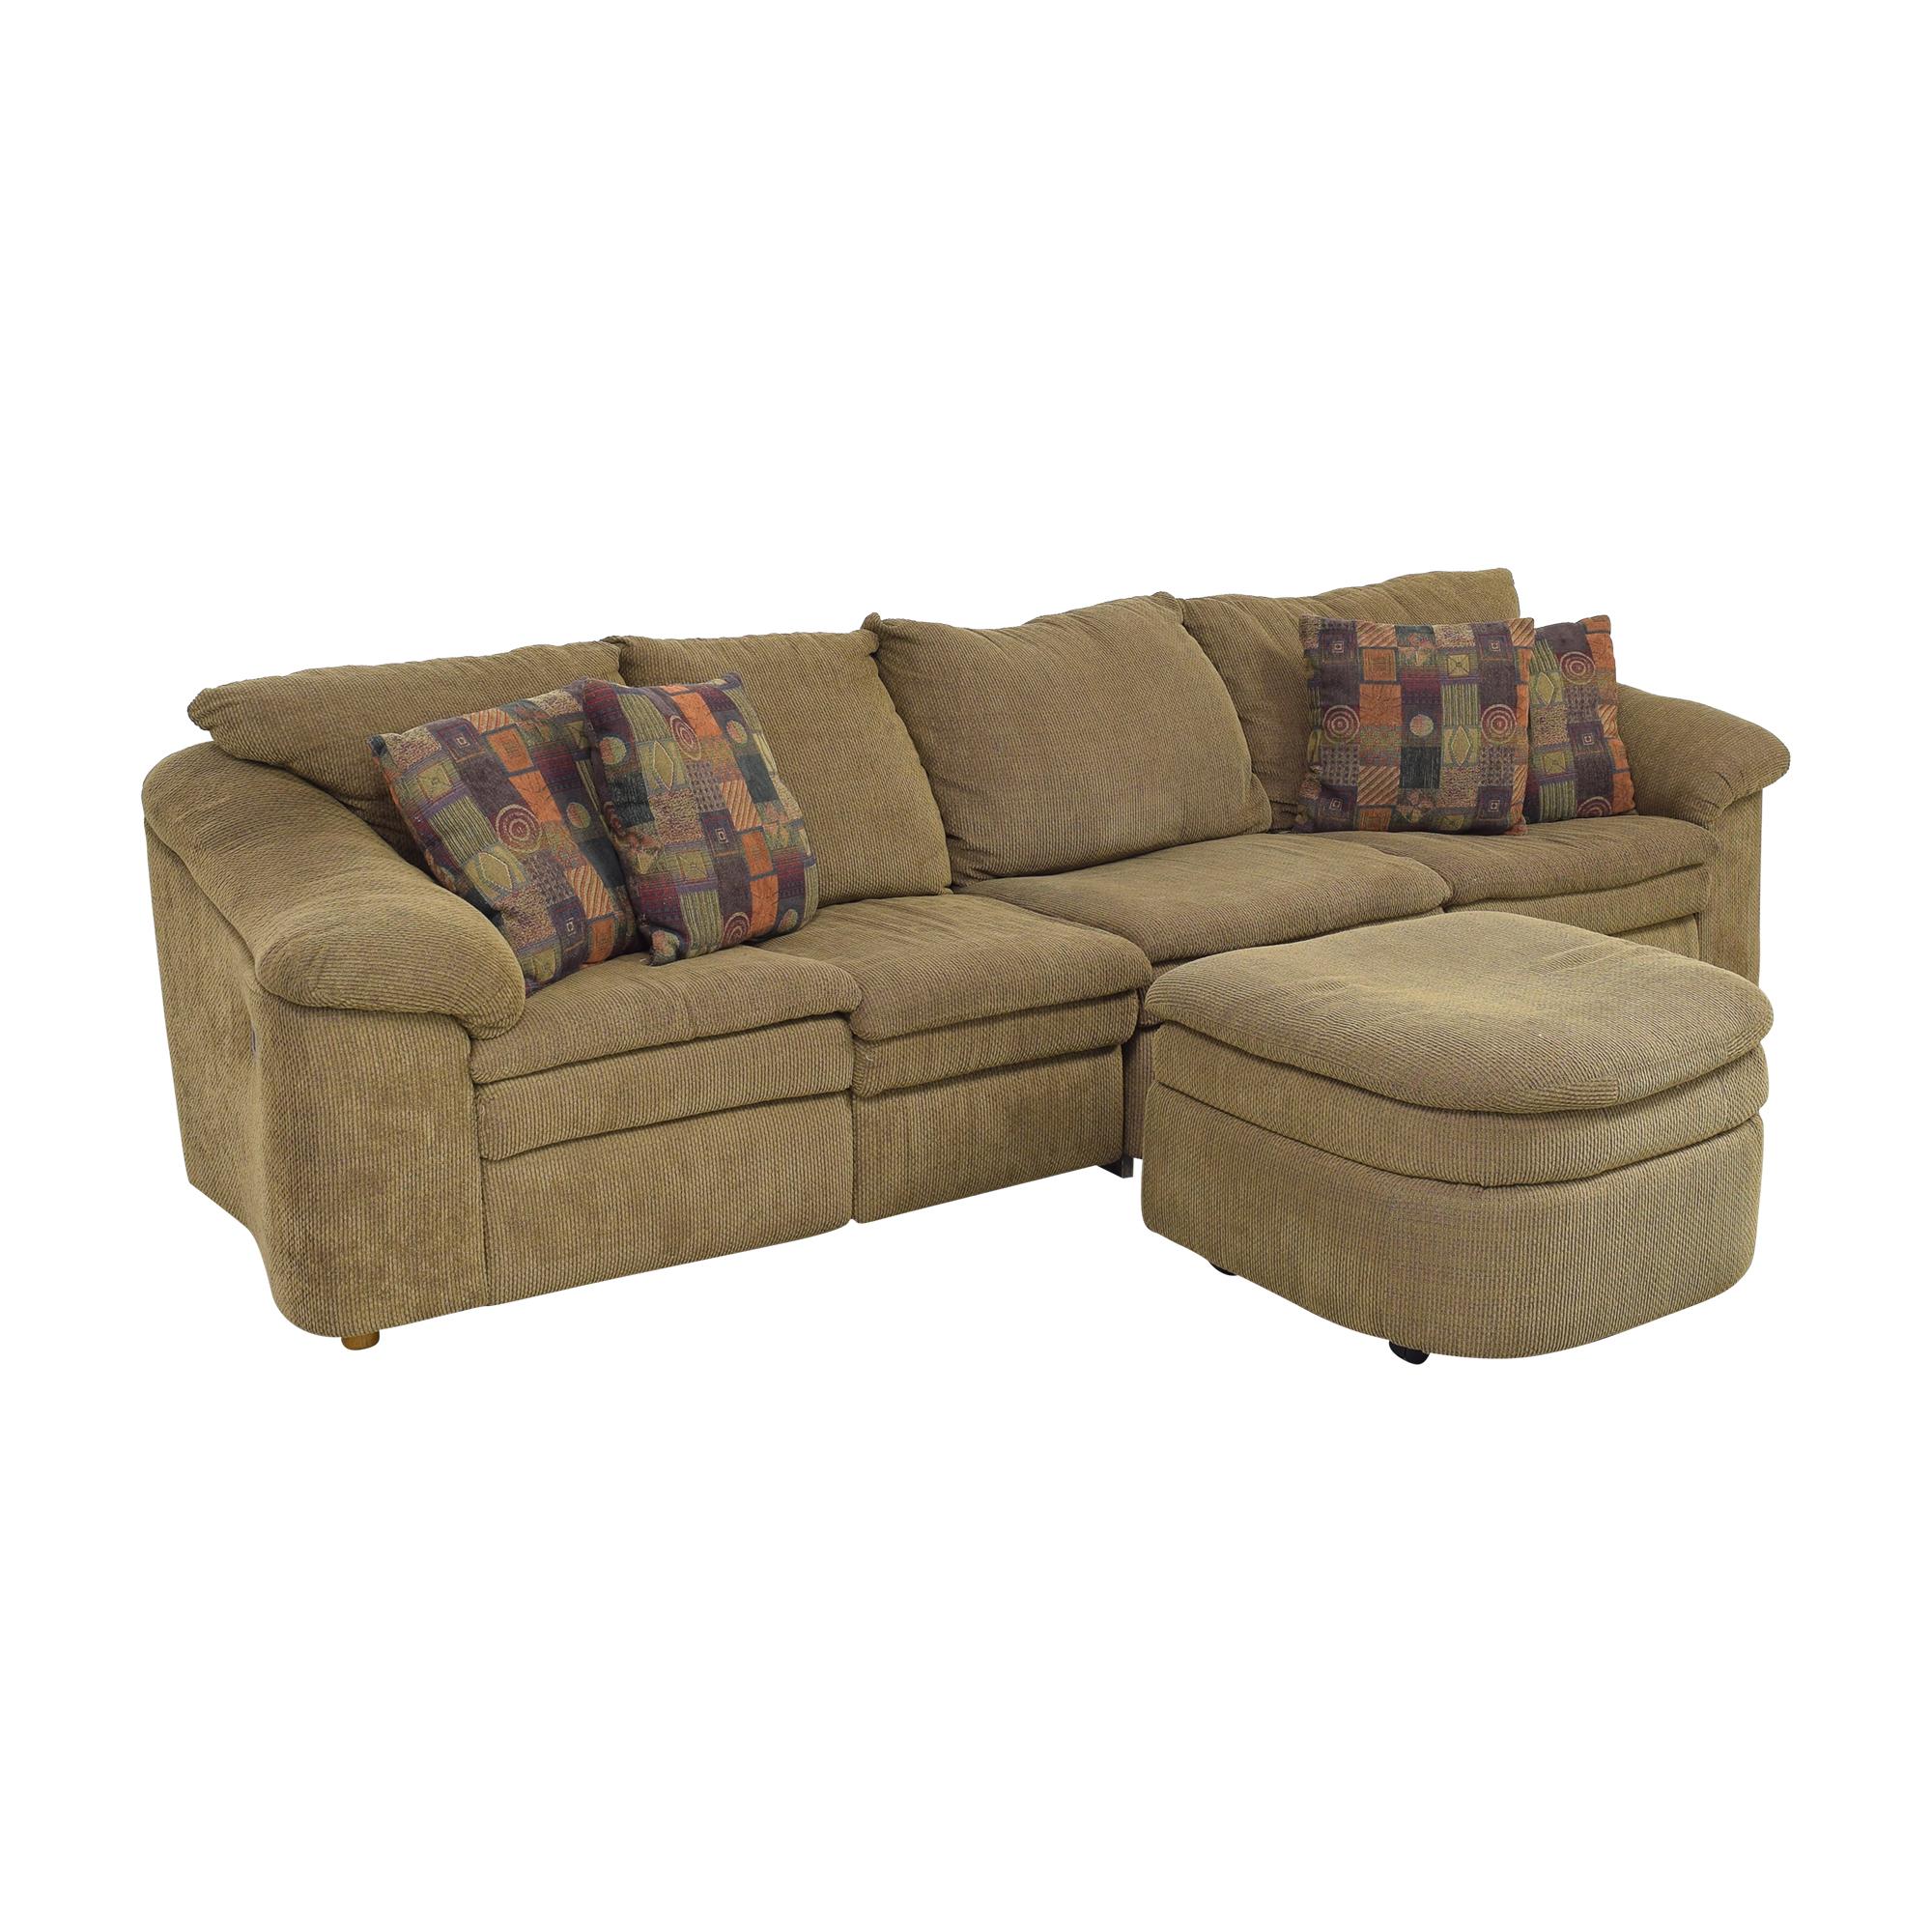 buy Raymour & Flanigan Sleeper Sofa with Ottoman Raymour & Flanigan Sofas